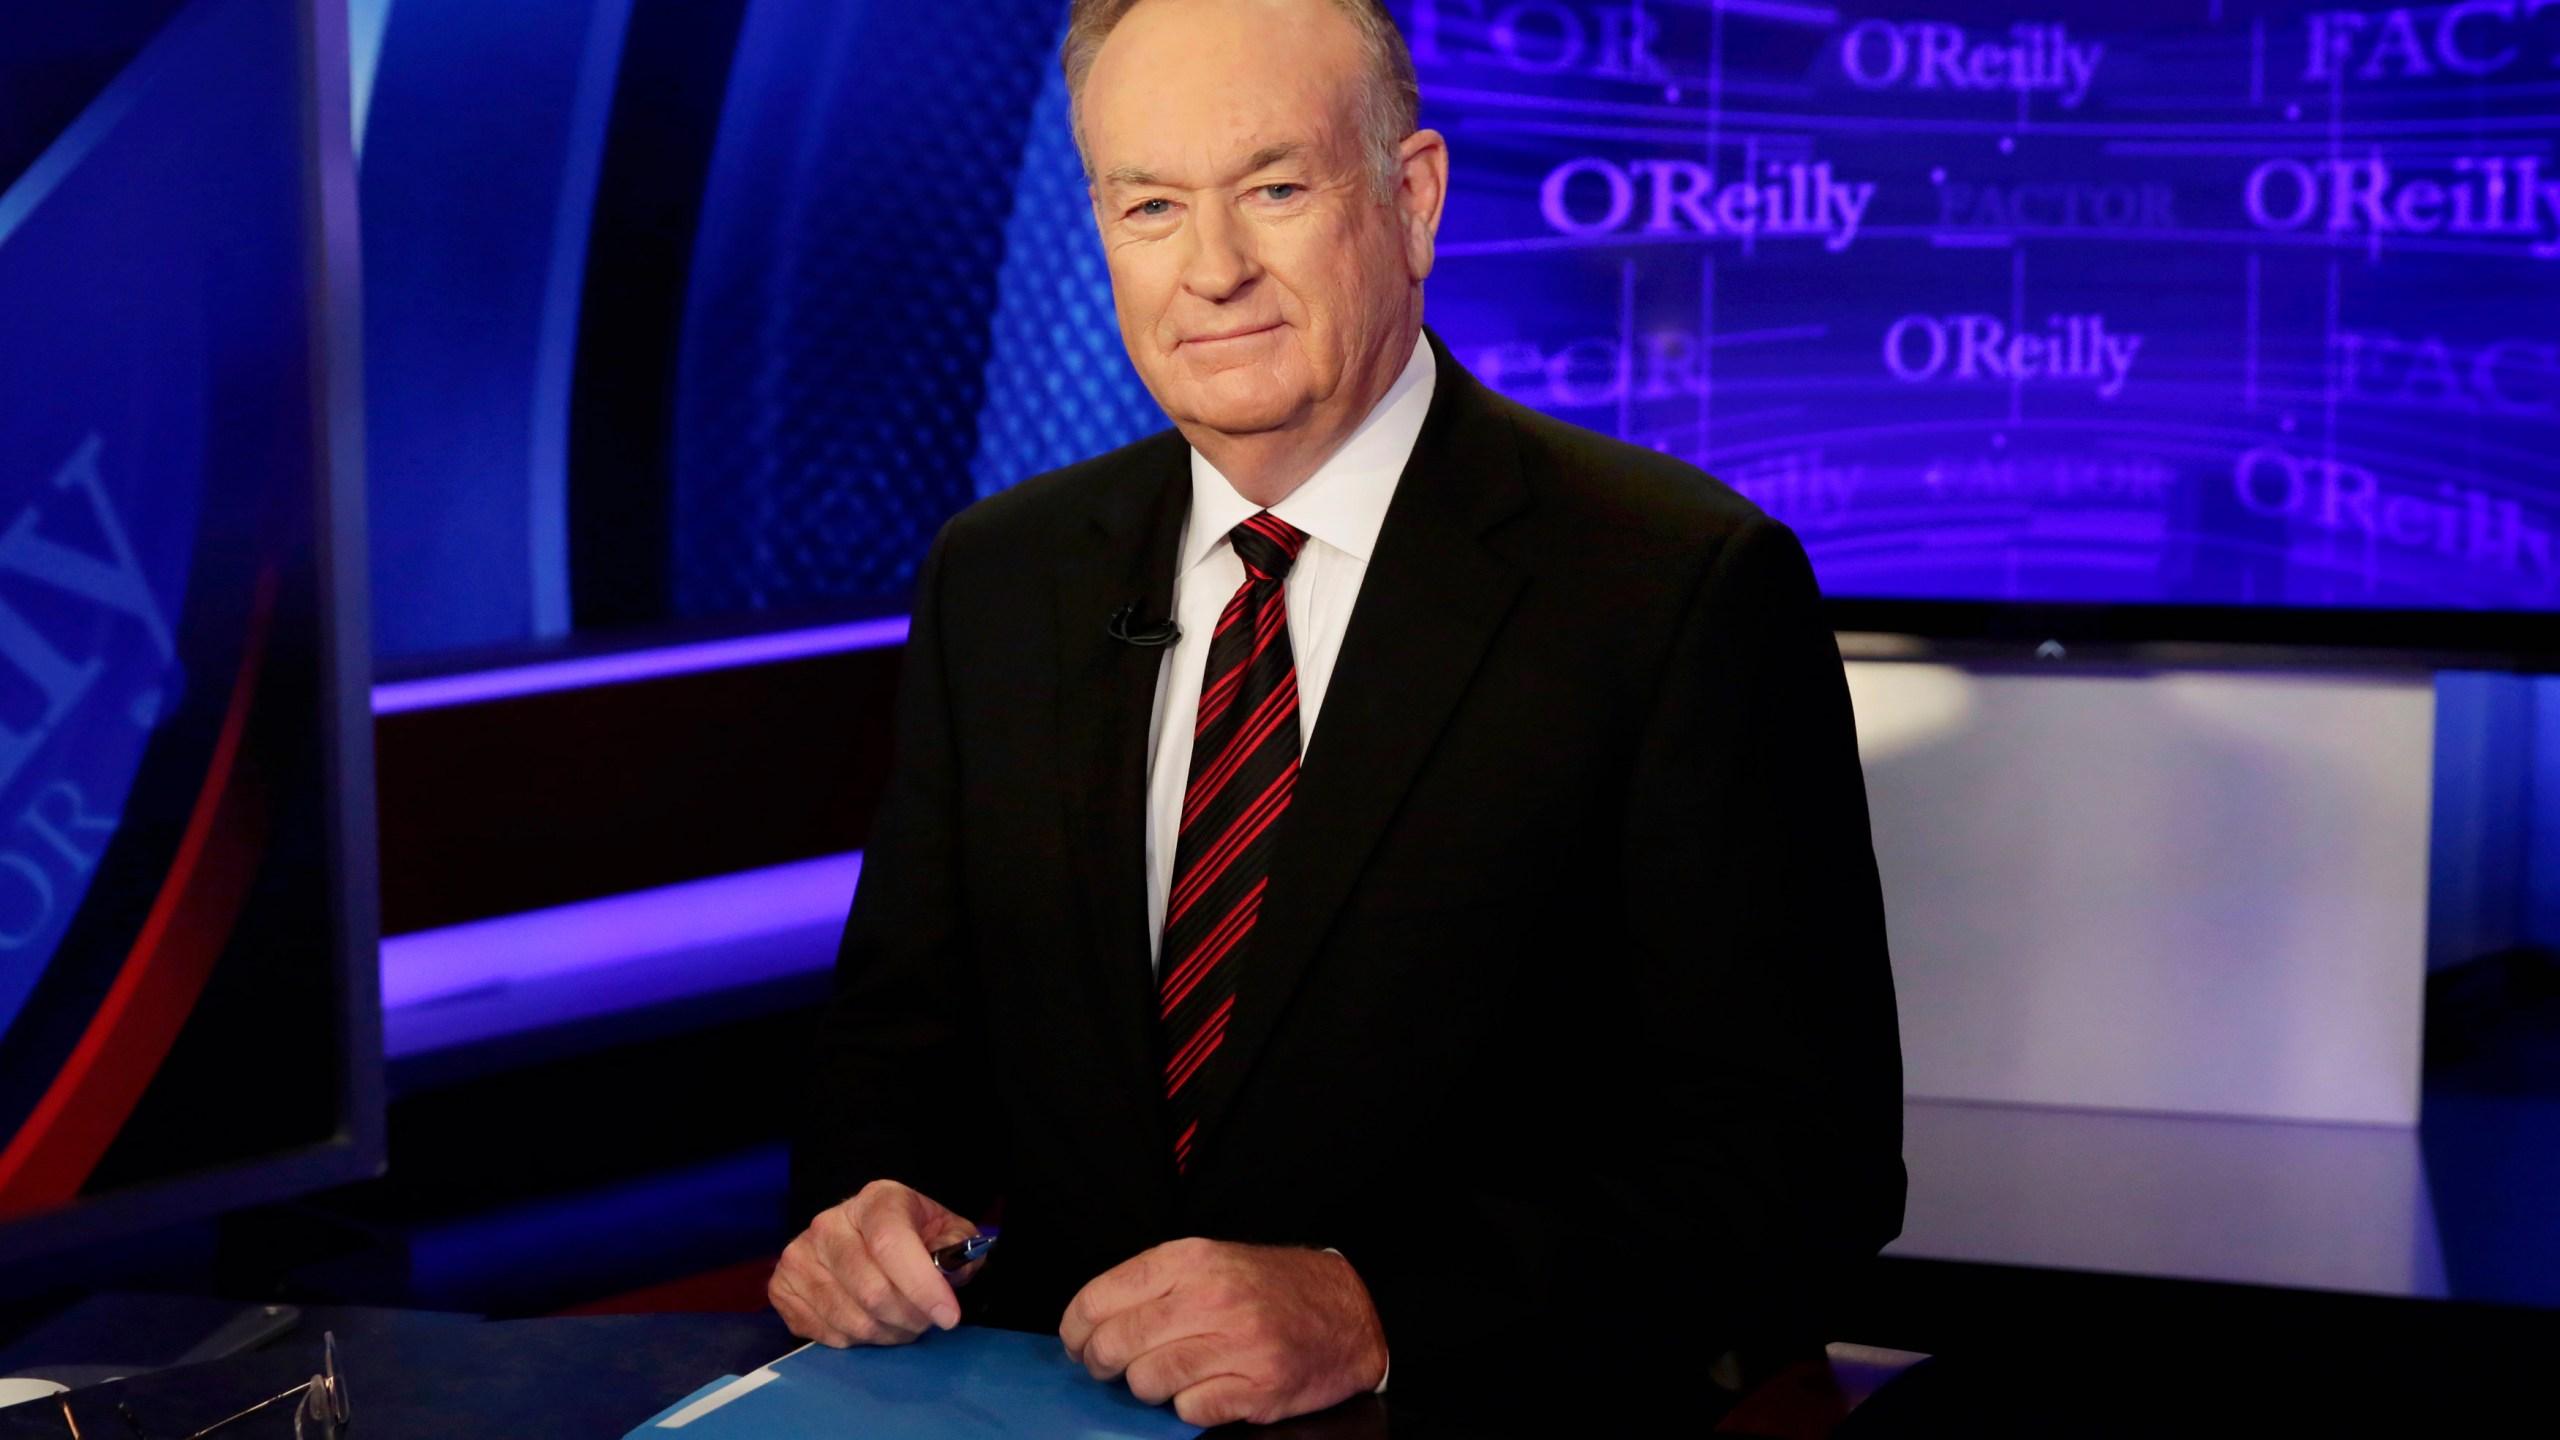 Bill O'Reilly